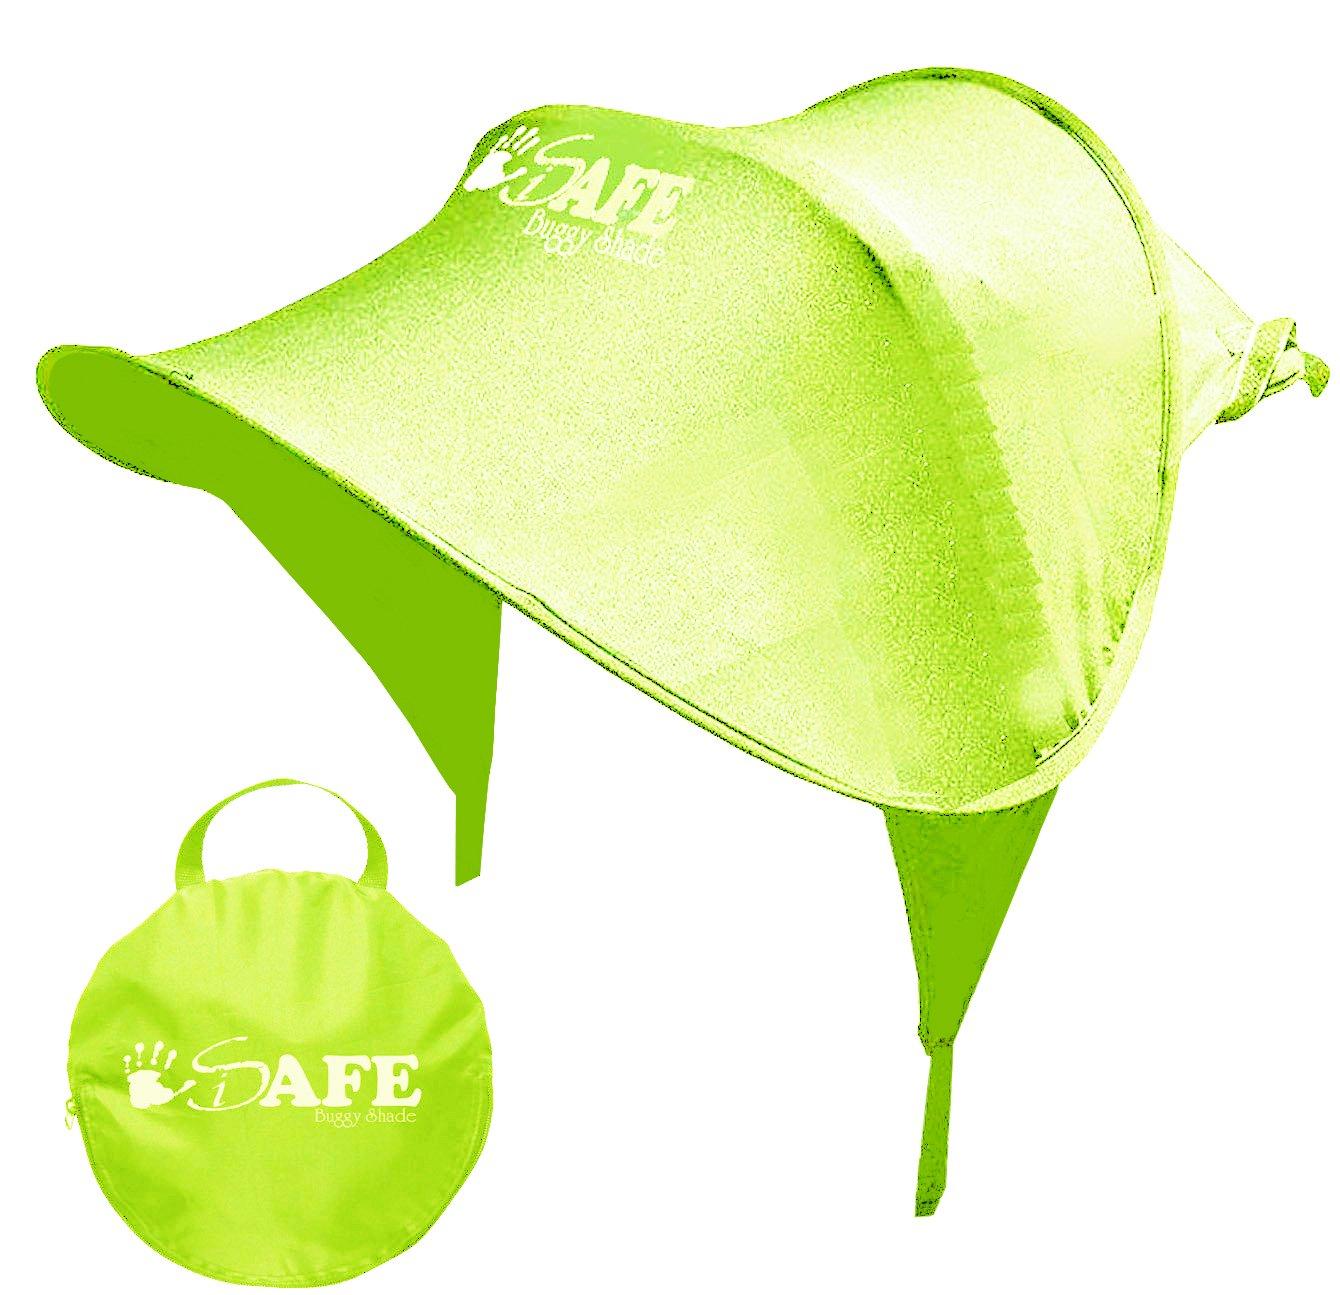 iSafe Buggy Shade Universal Stroller Sun Shade Maker - Lime I-Safe sh-lim